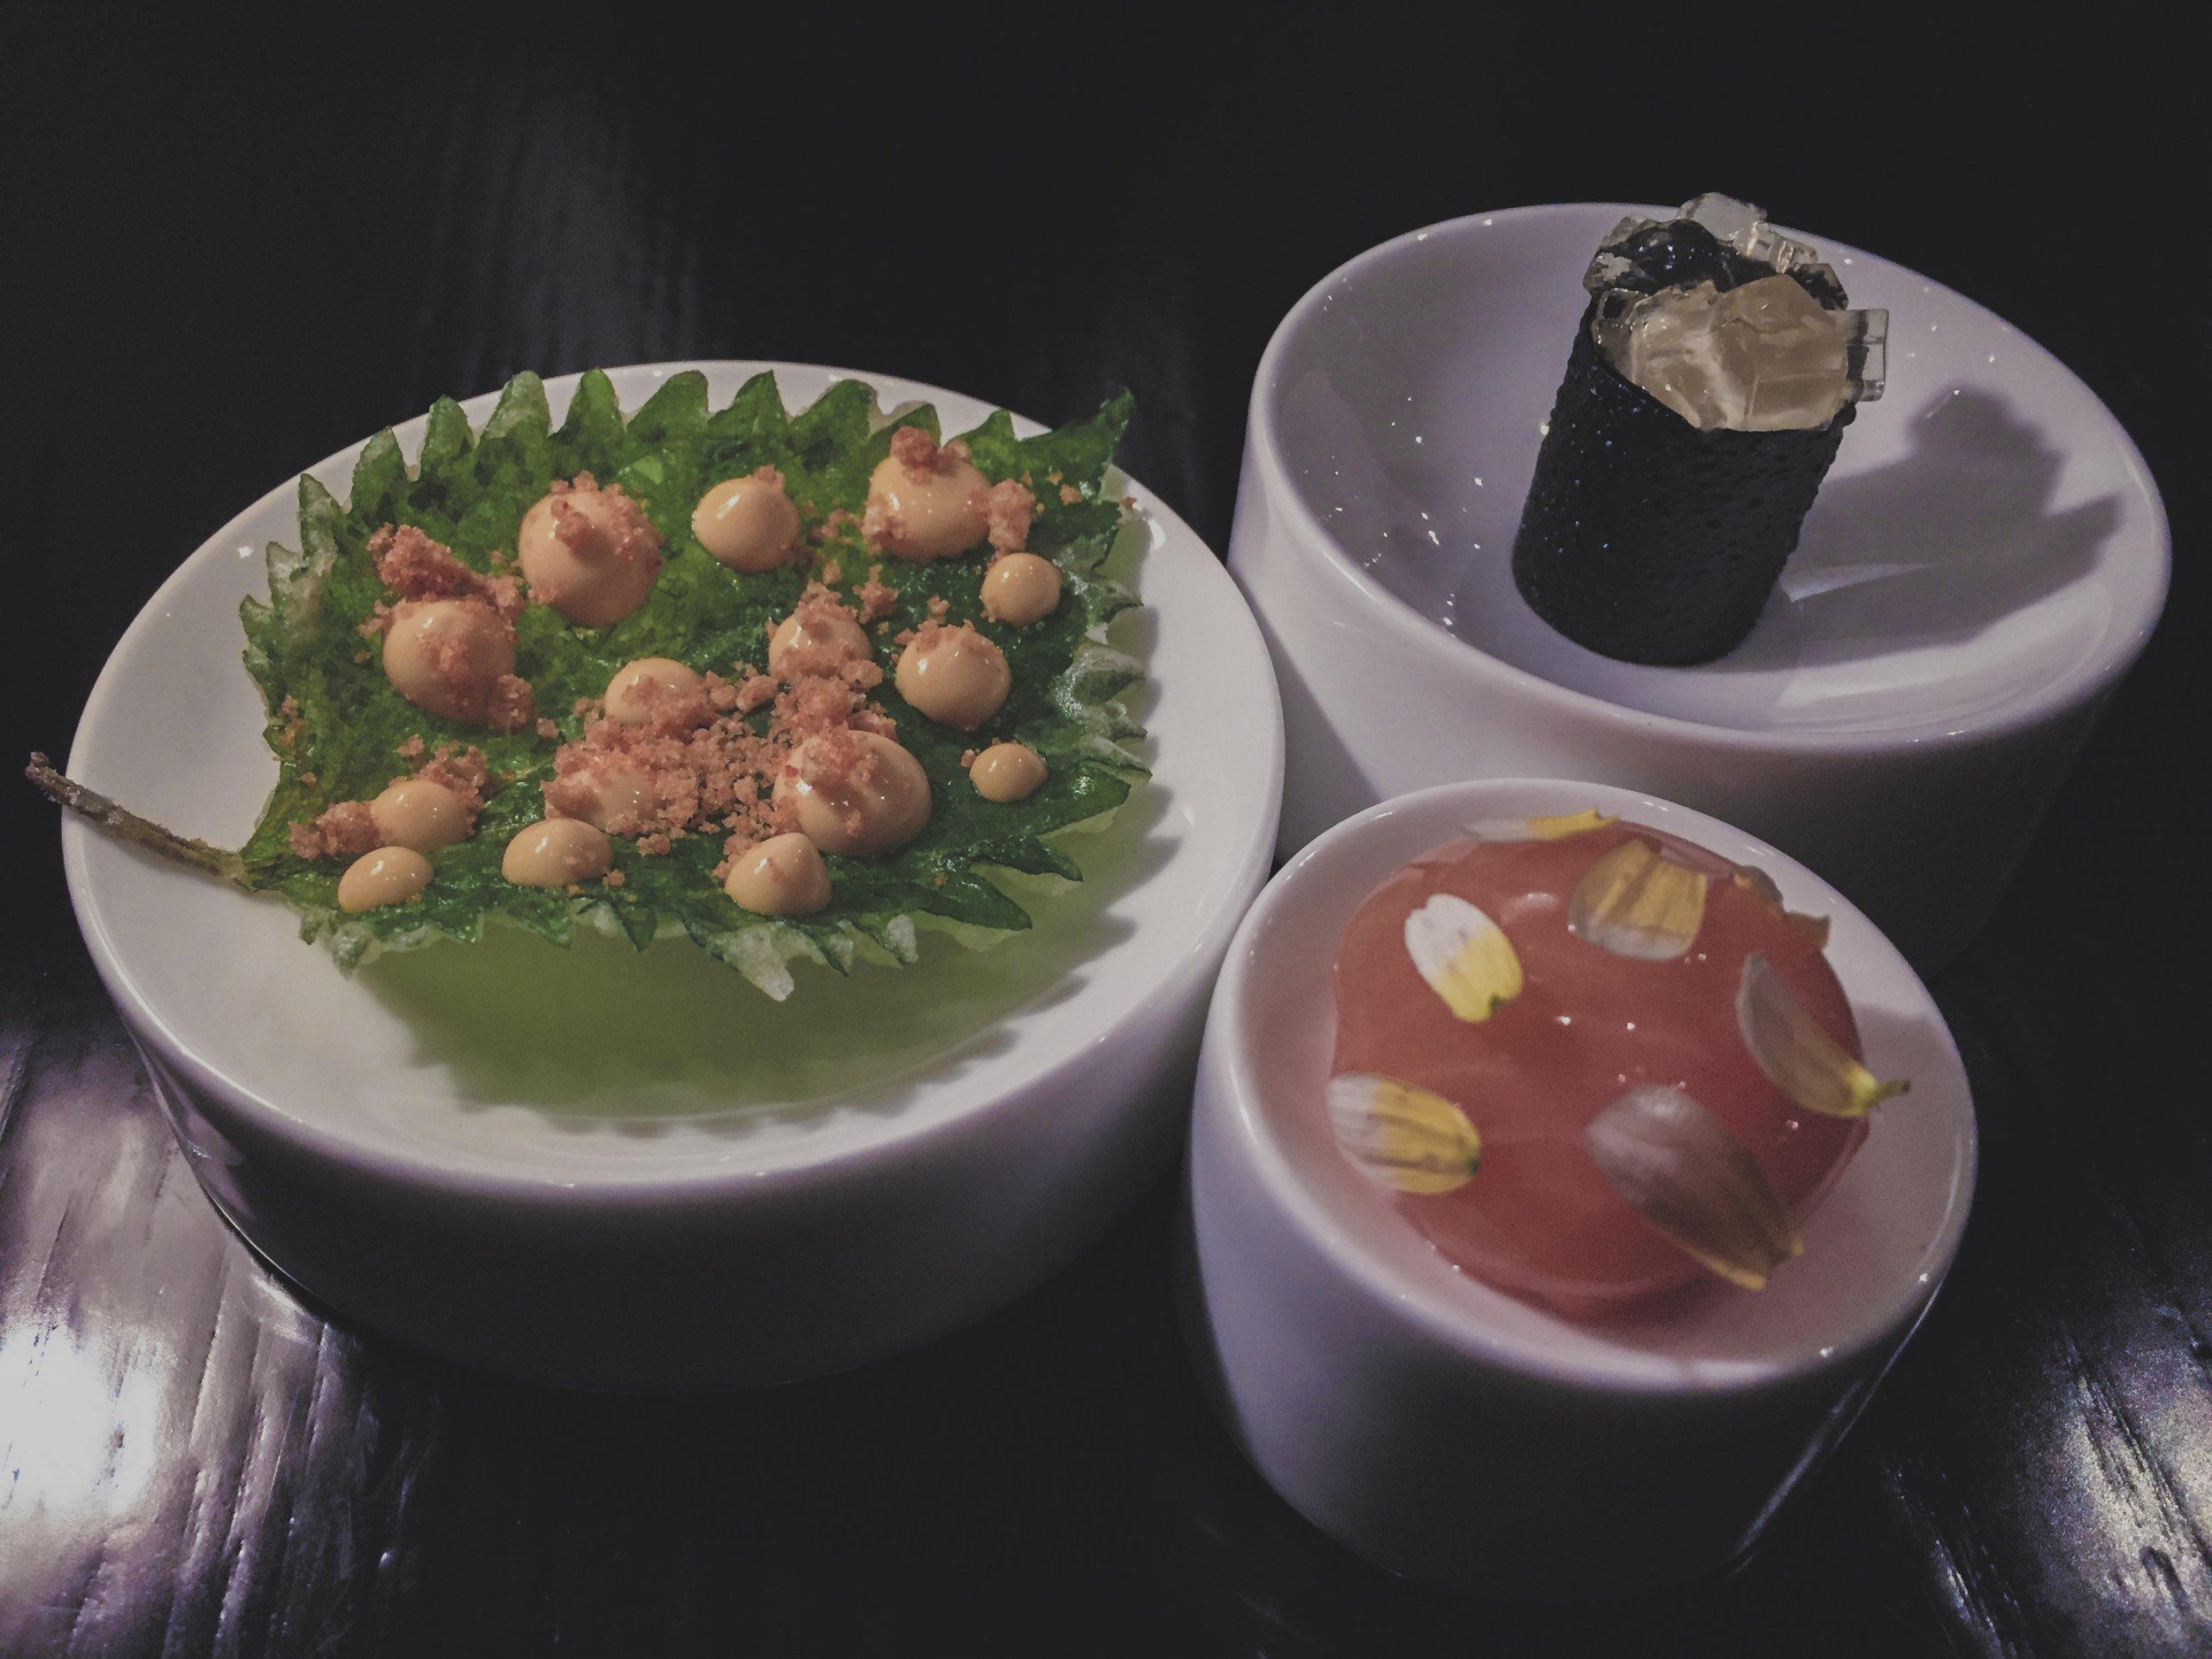 Clockwise from the top: Hiramasa kingfish, dashi cream, water chestnut, nori, dashi jelly.                                                                        Saikou salmon, smoked roe, sudachi, chrysanthemum.                                                                                                   Tempura oba, smoked amaebi, shell powder.